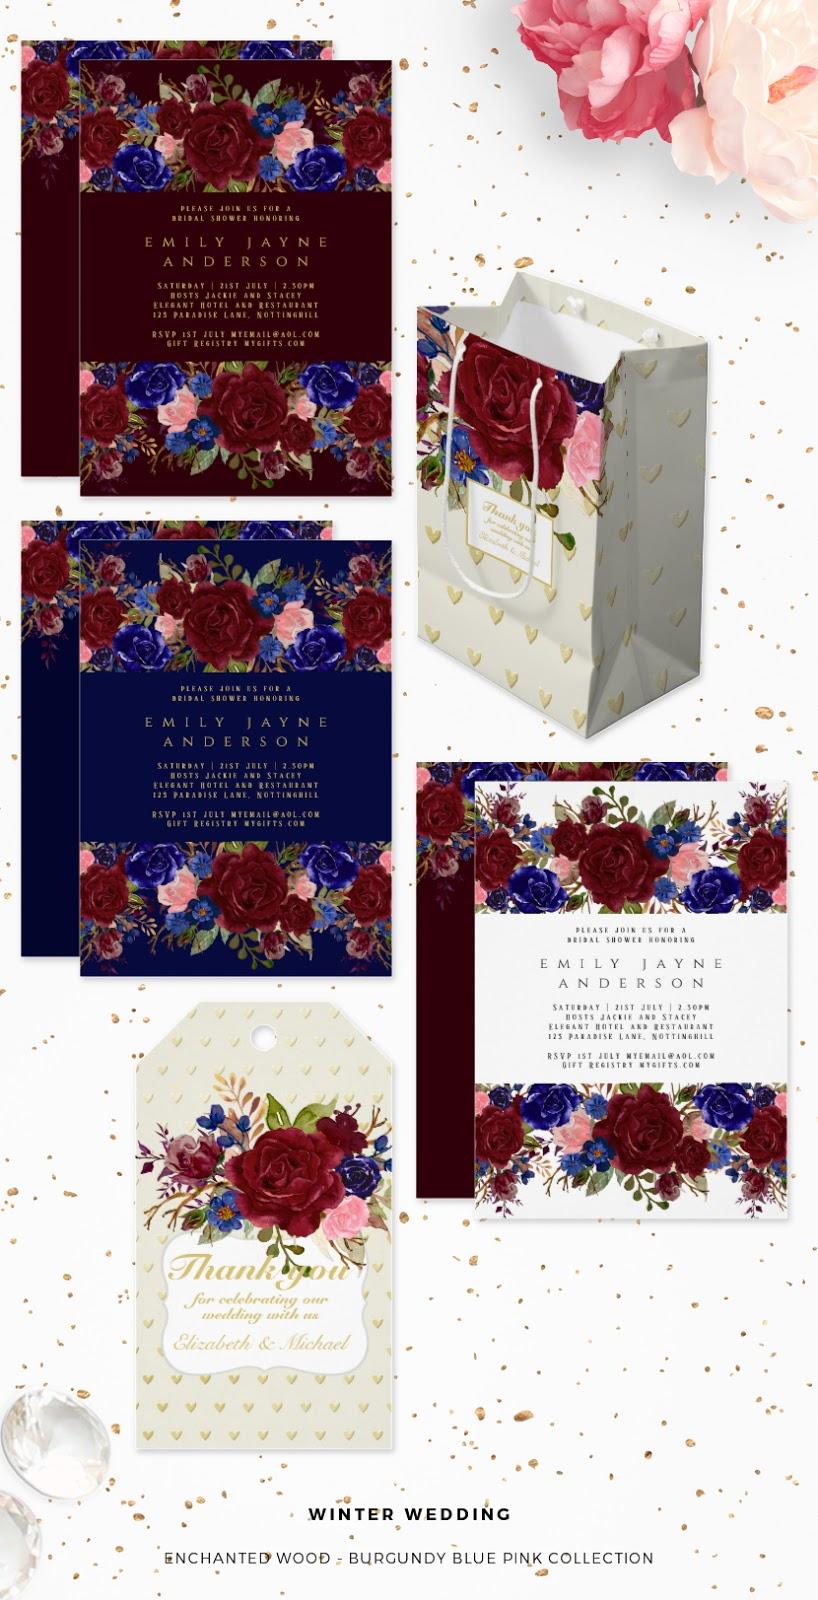 winter wedding invitations navy blue burgundy floral